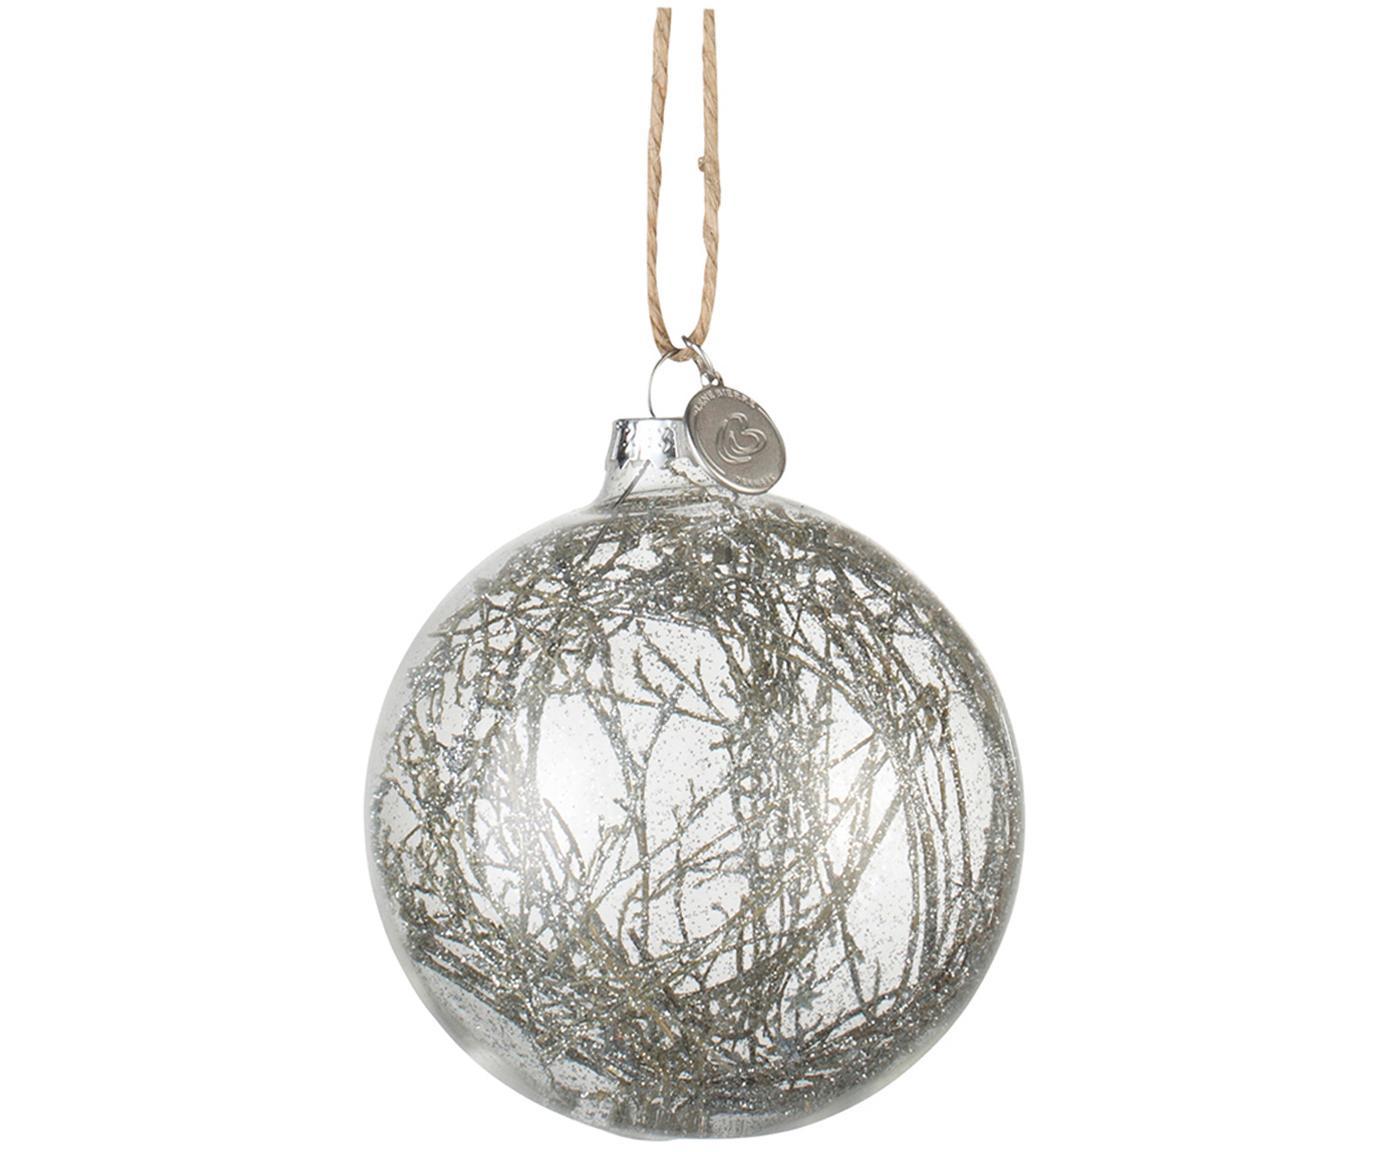 Kerstballen Mernia, 2 stuks, Ophanglus: jute, Transparant, zilverkleurig, Ø 8 cm